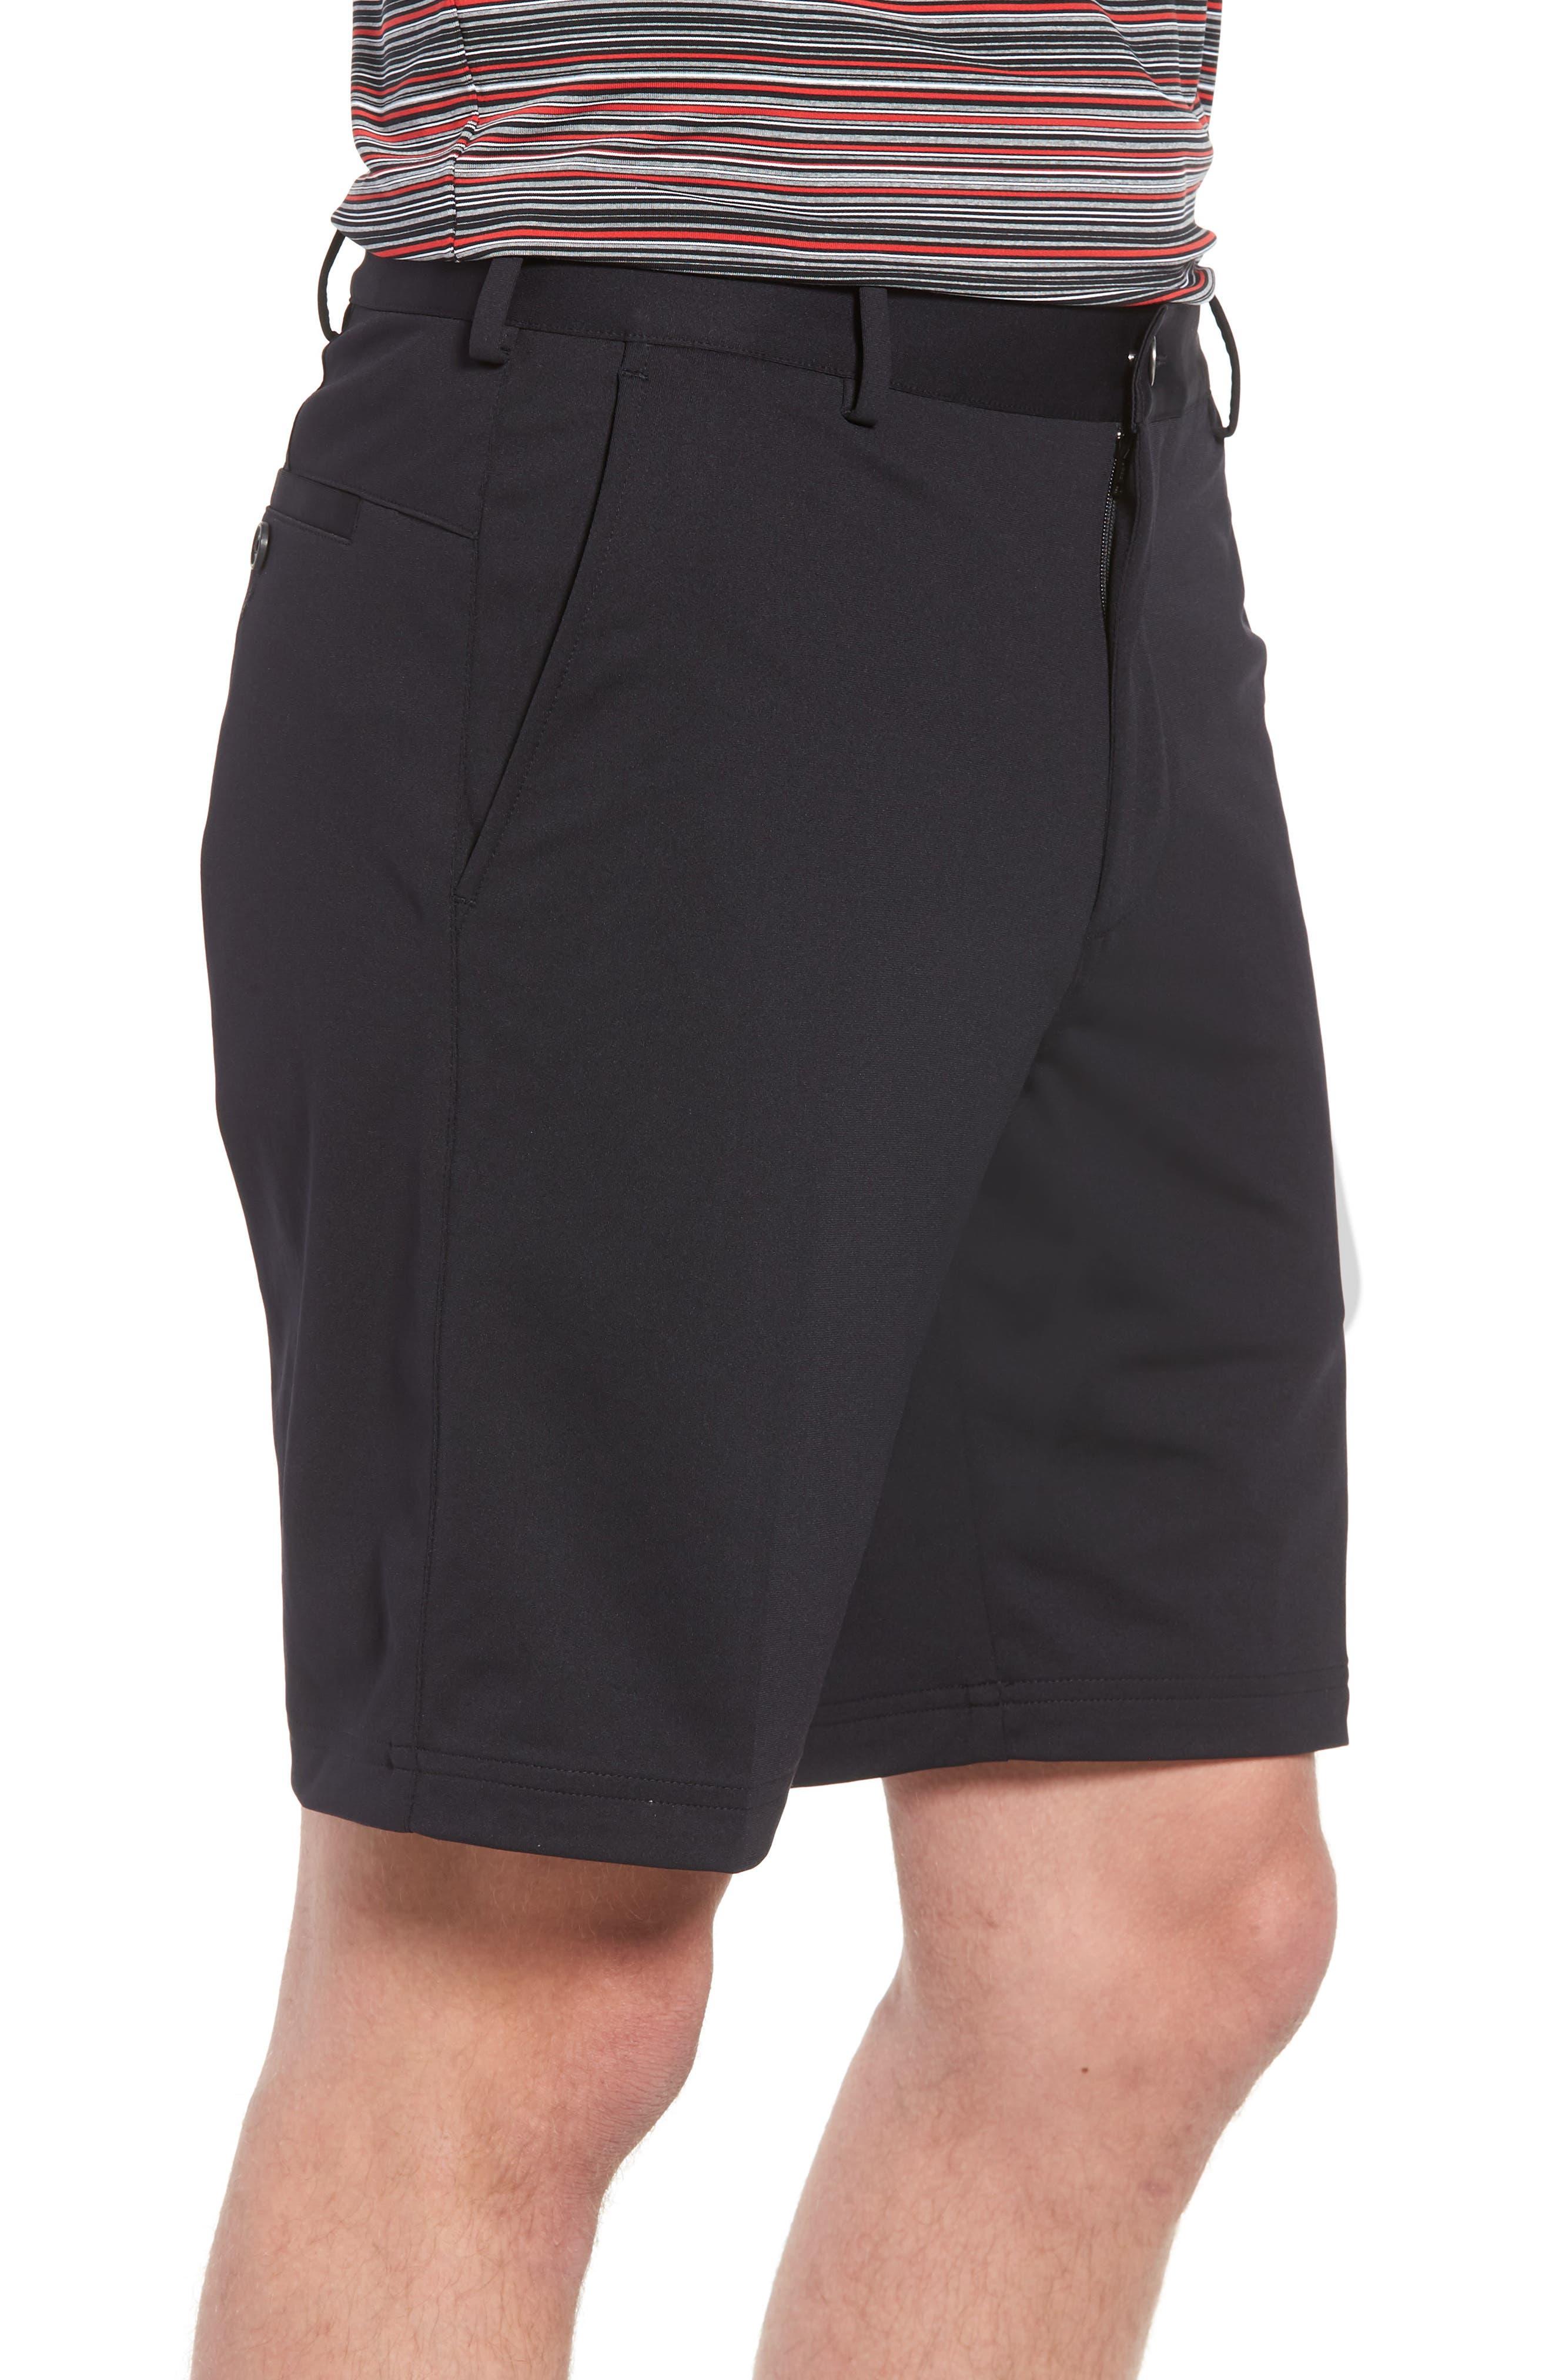 BOBBY JONES,                             Trim Fit Tech Chino Shorts,                             Alternate thumbnail 3, color,                             001